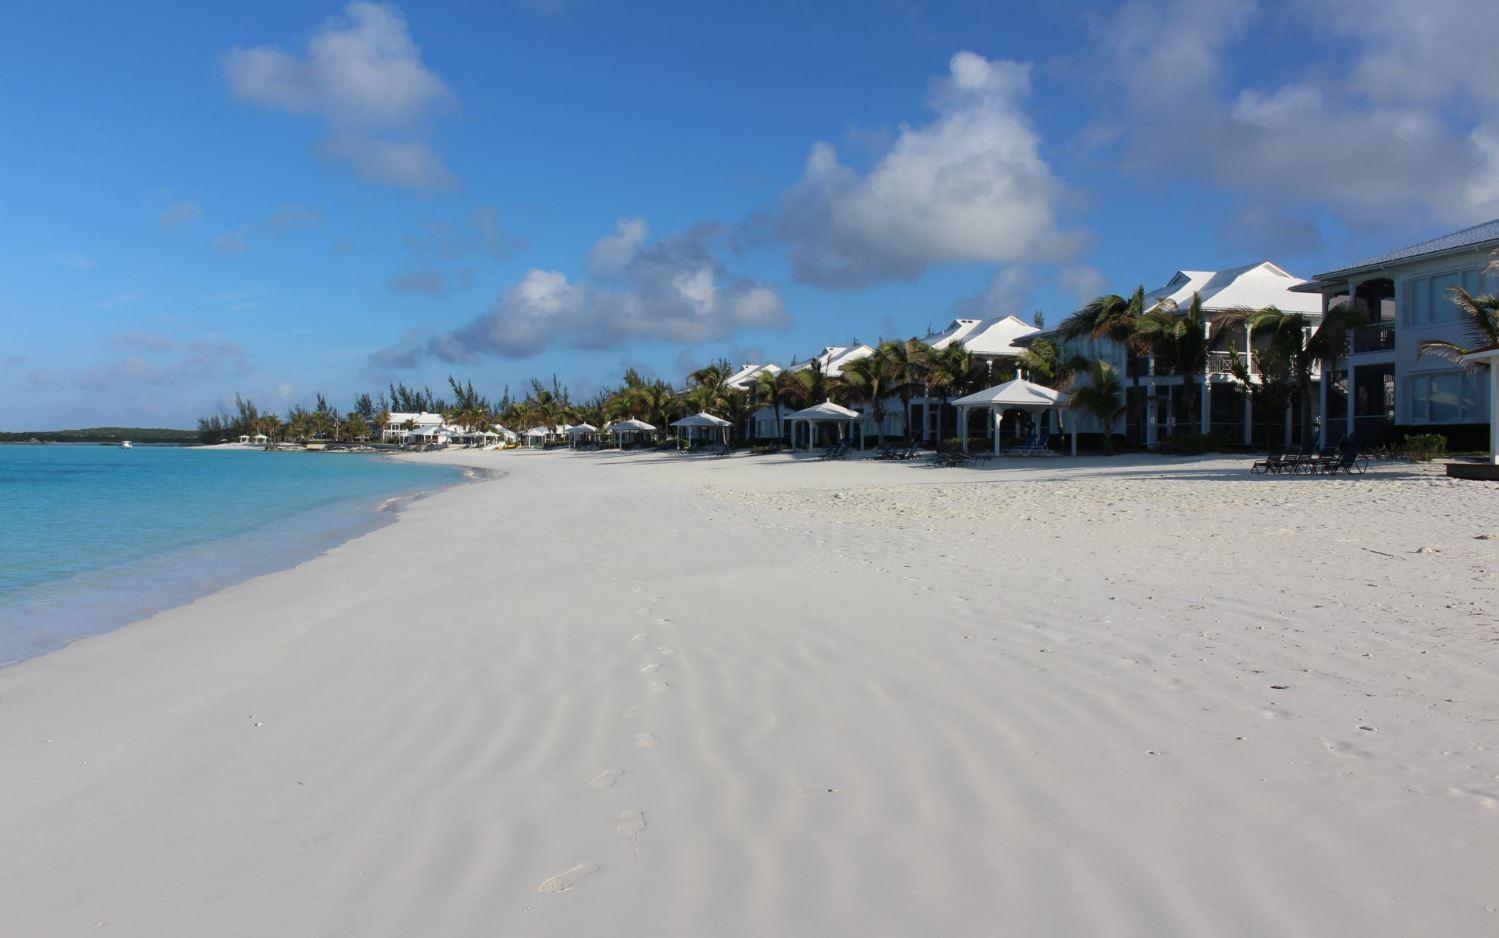 Cape Santa Maria Beach Resort, Long Island, Bahamas. Author and Copyright Marco Ramerini ..